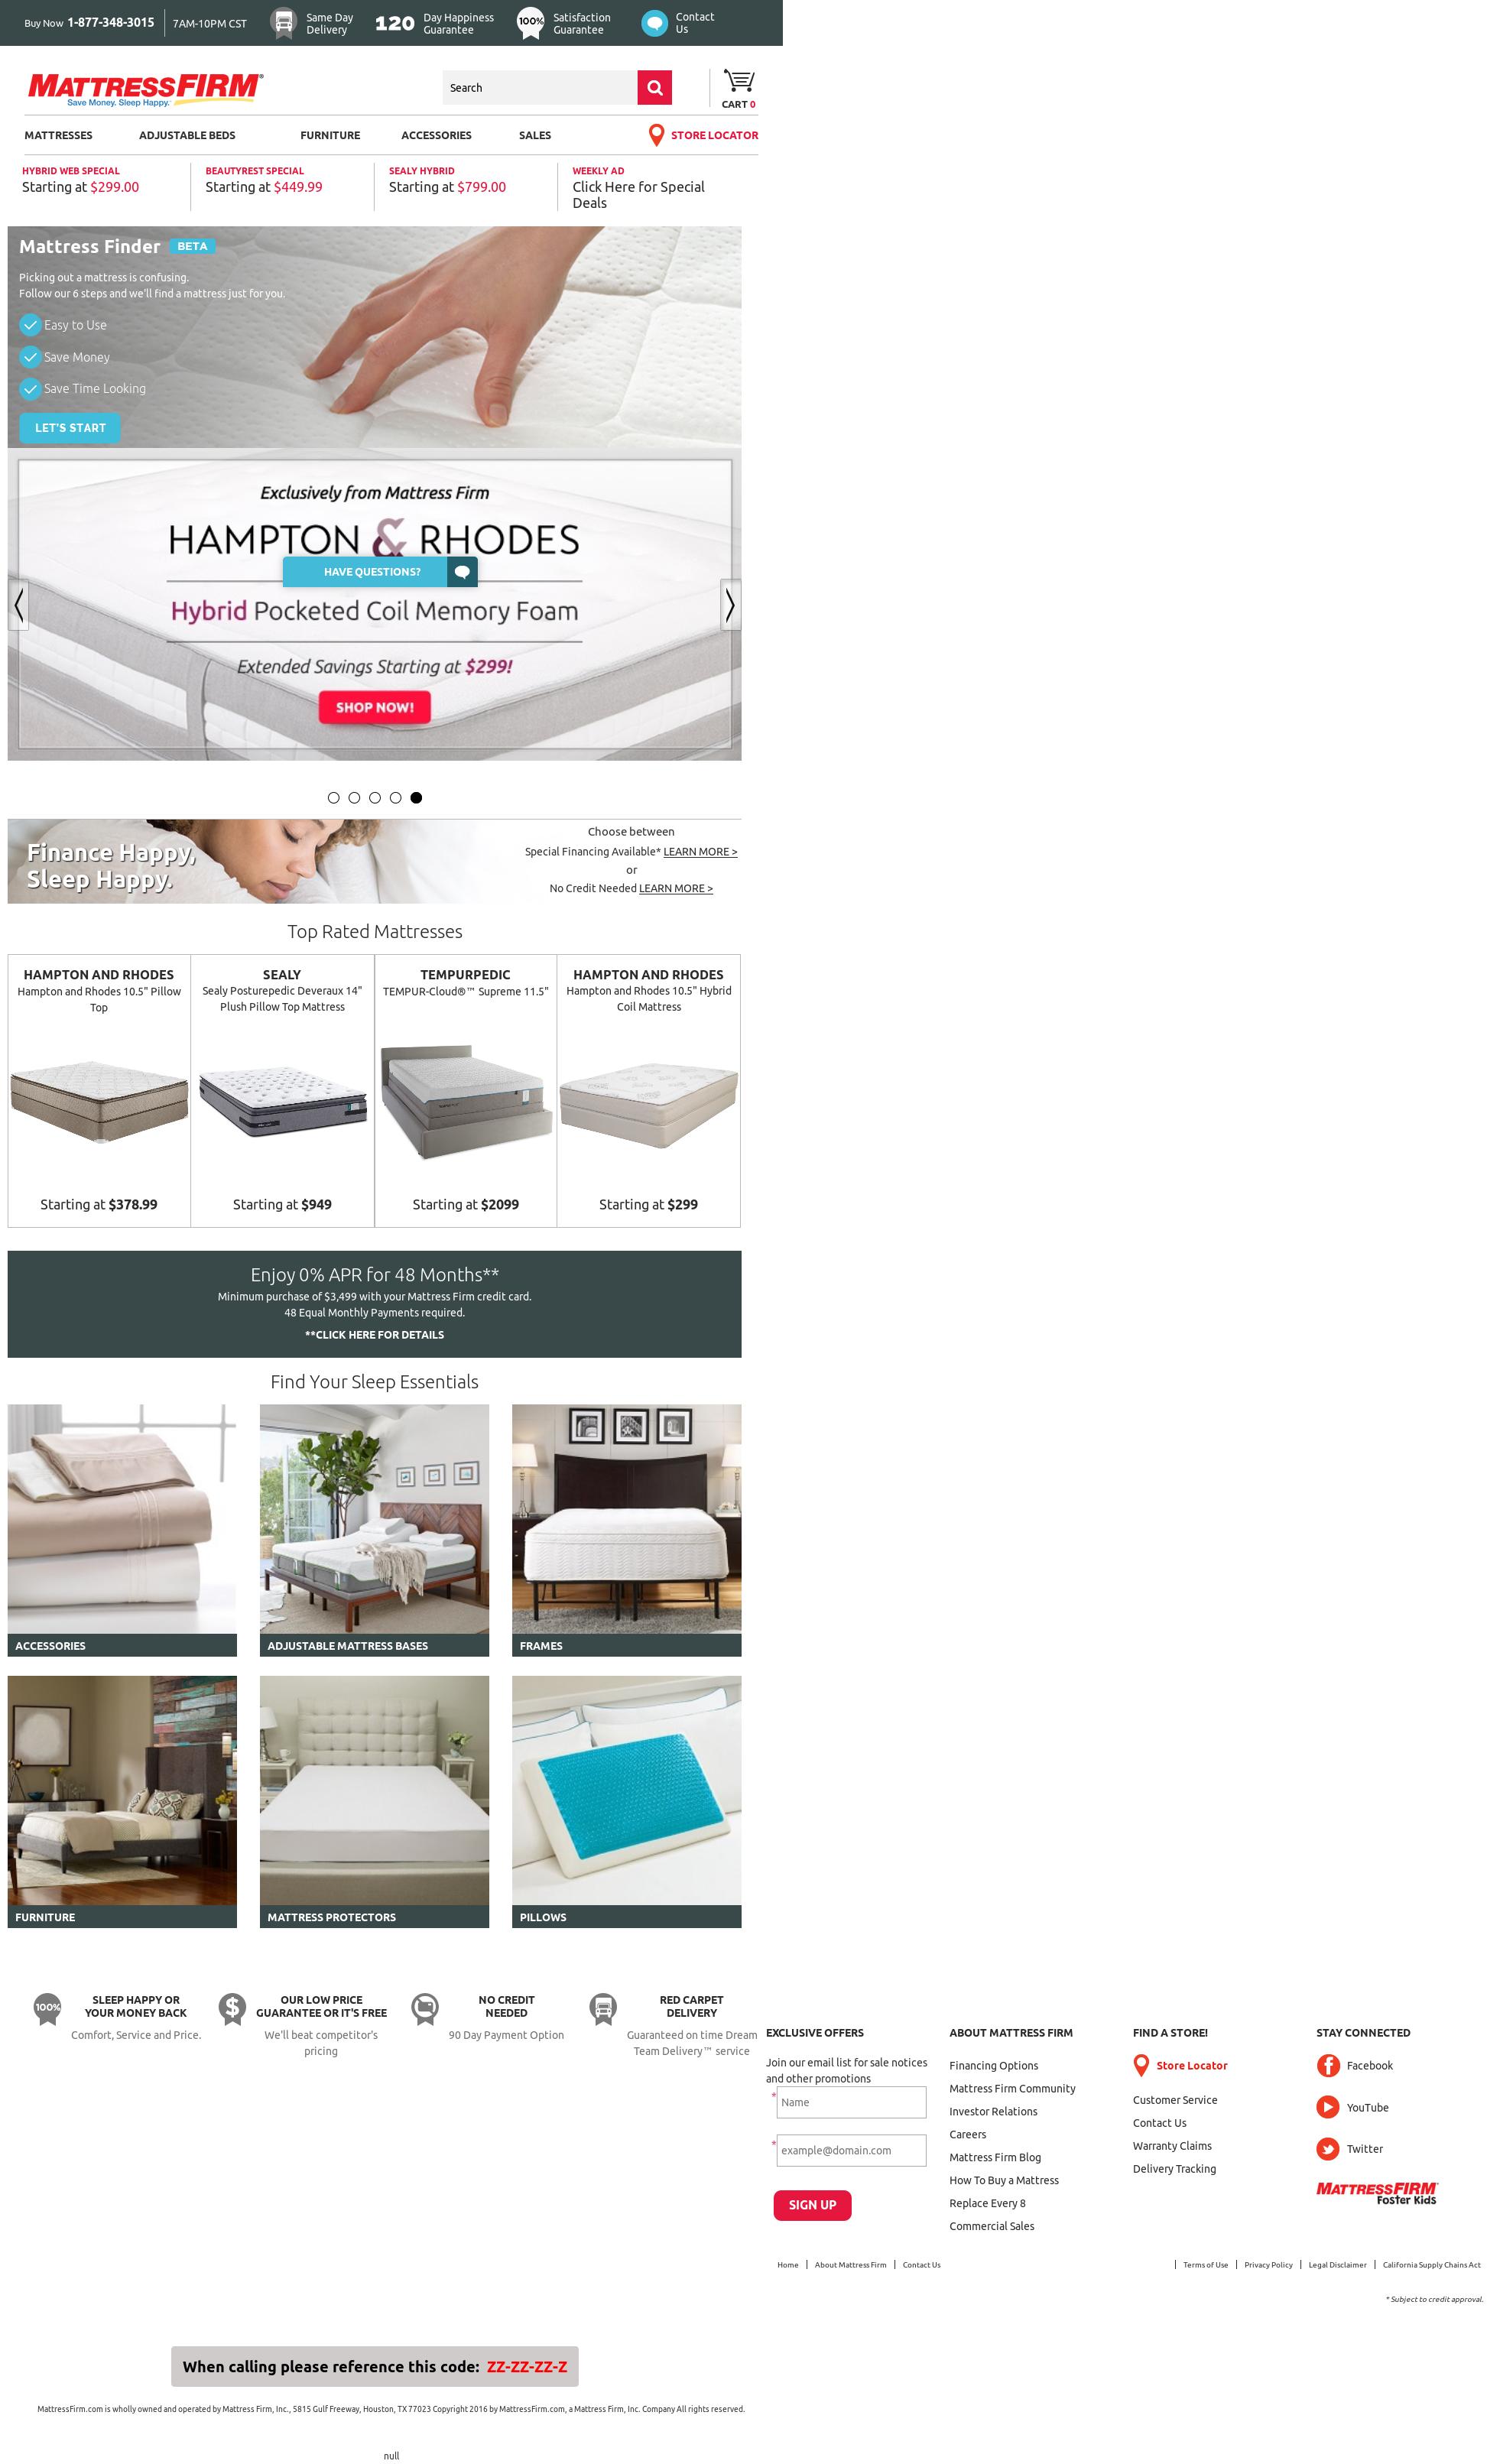 mattressfirm com smart mattress firm img signs brite